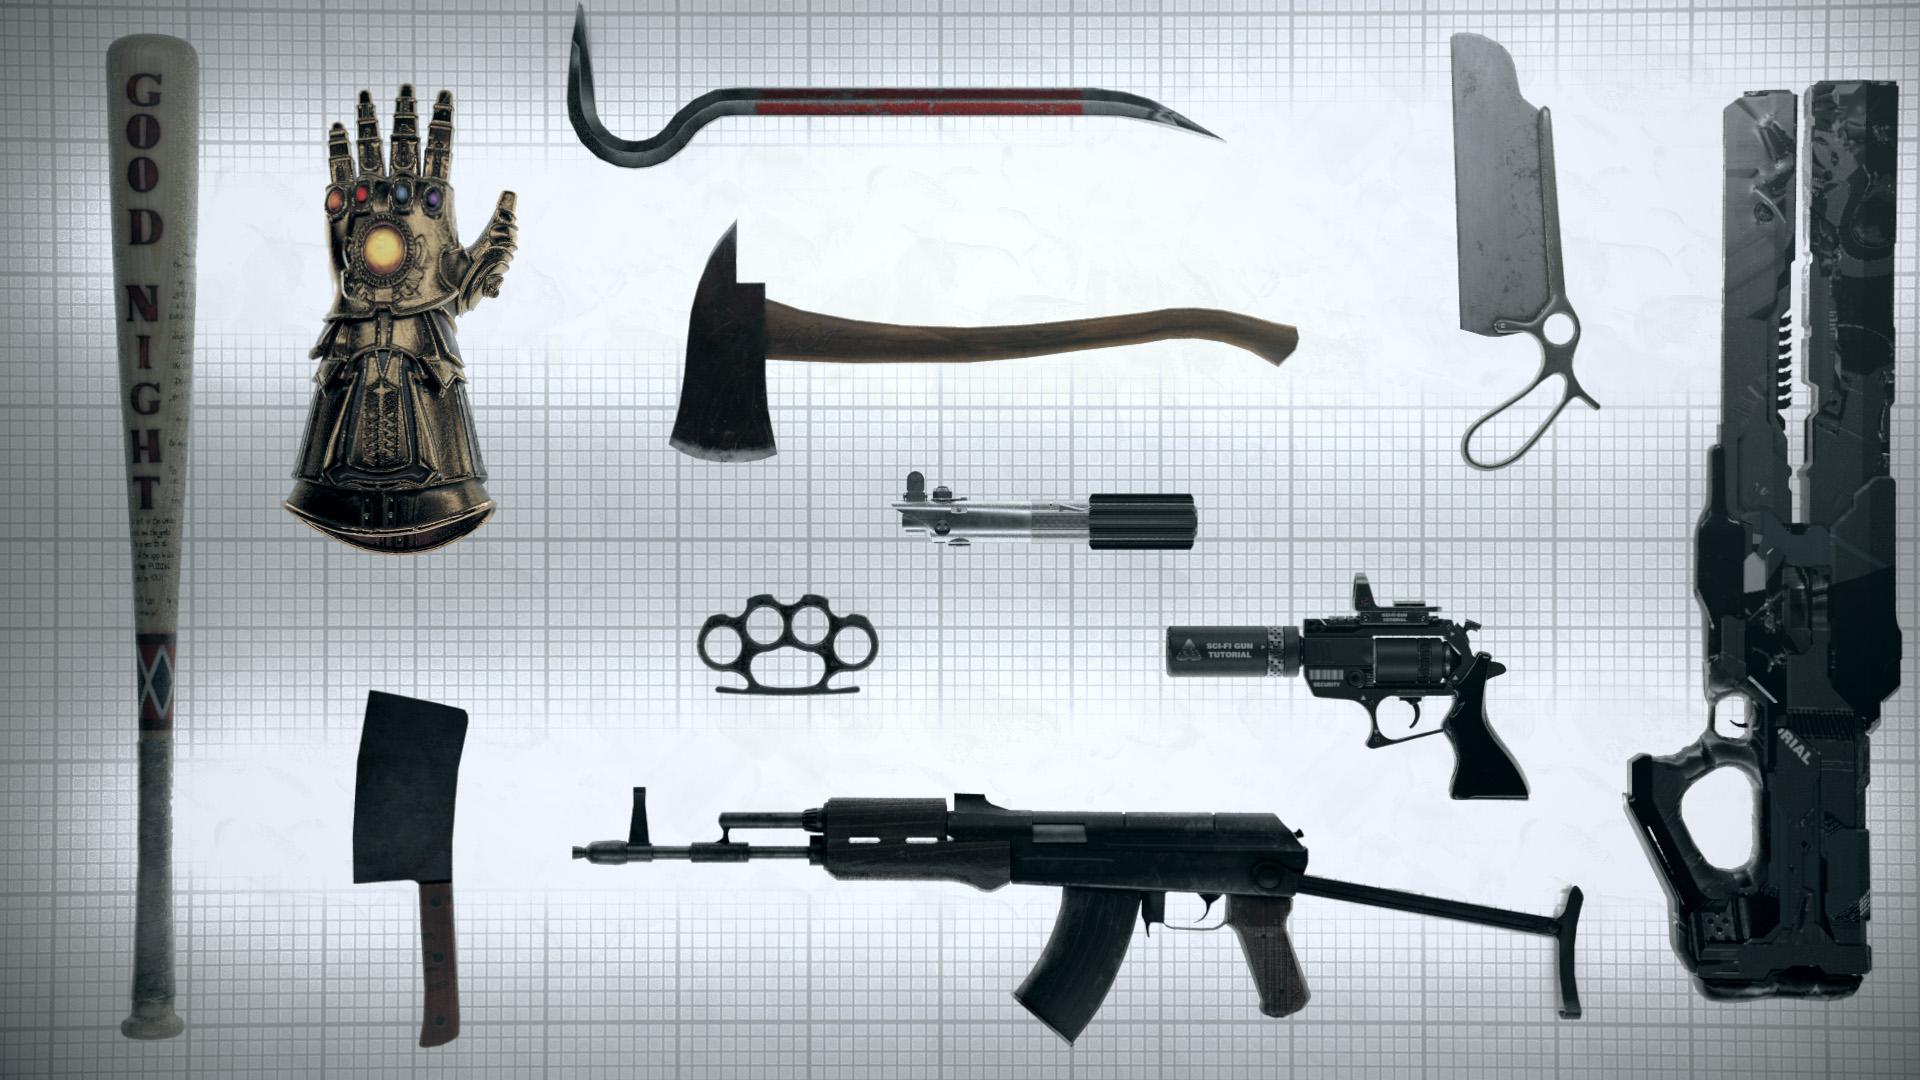 SV_lab_weaponTable_HC_v05-0-00-00-00